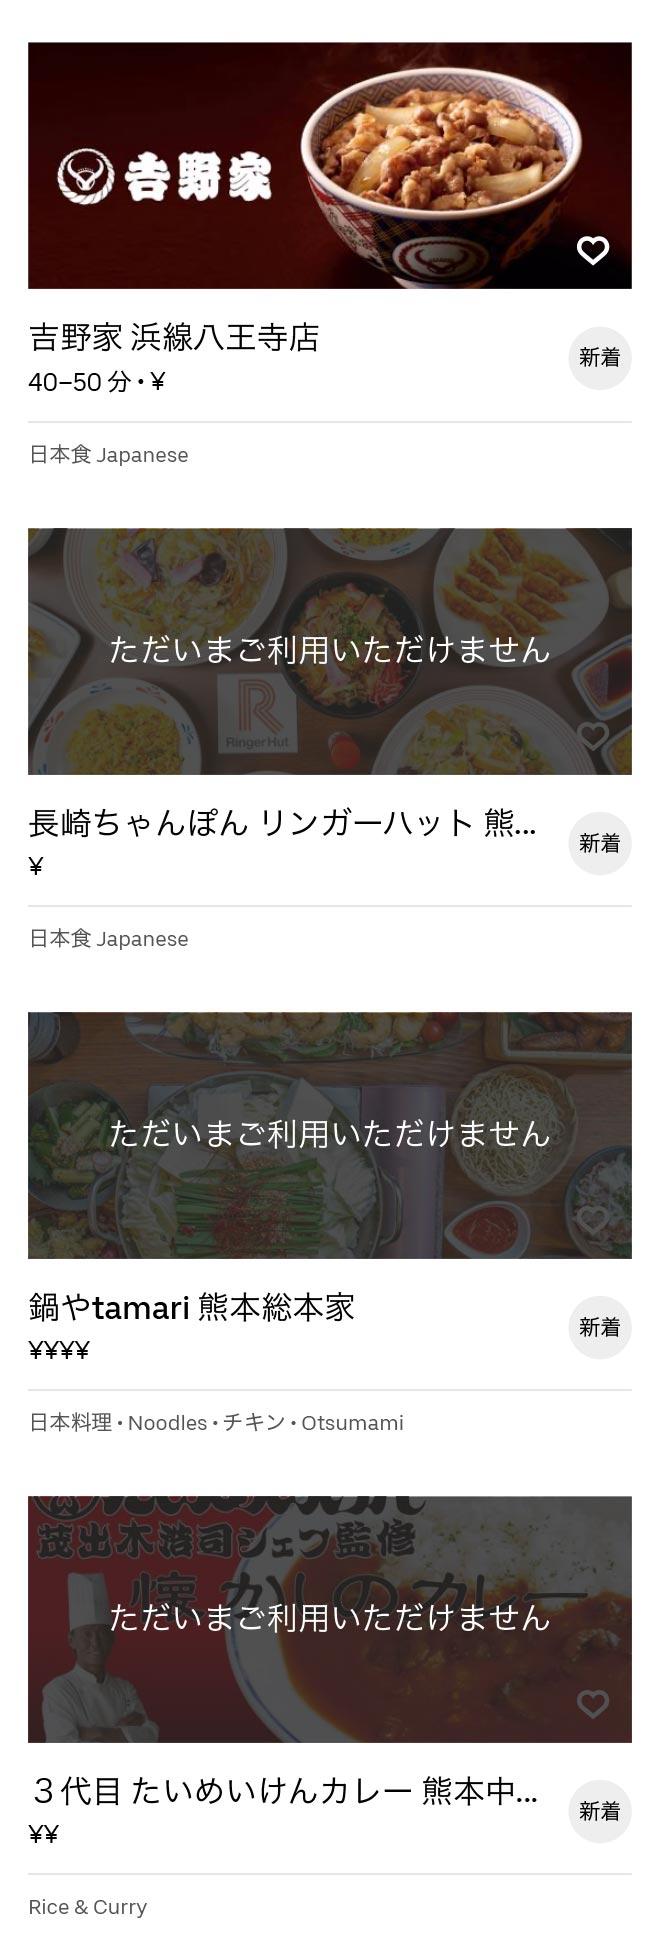 Kumamoto menu 2008 07